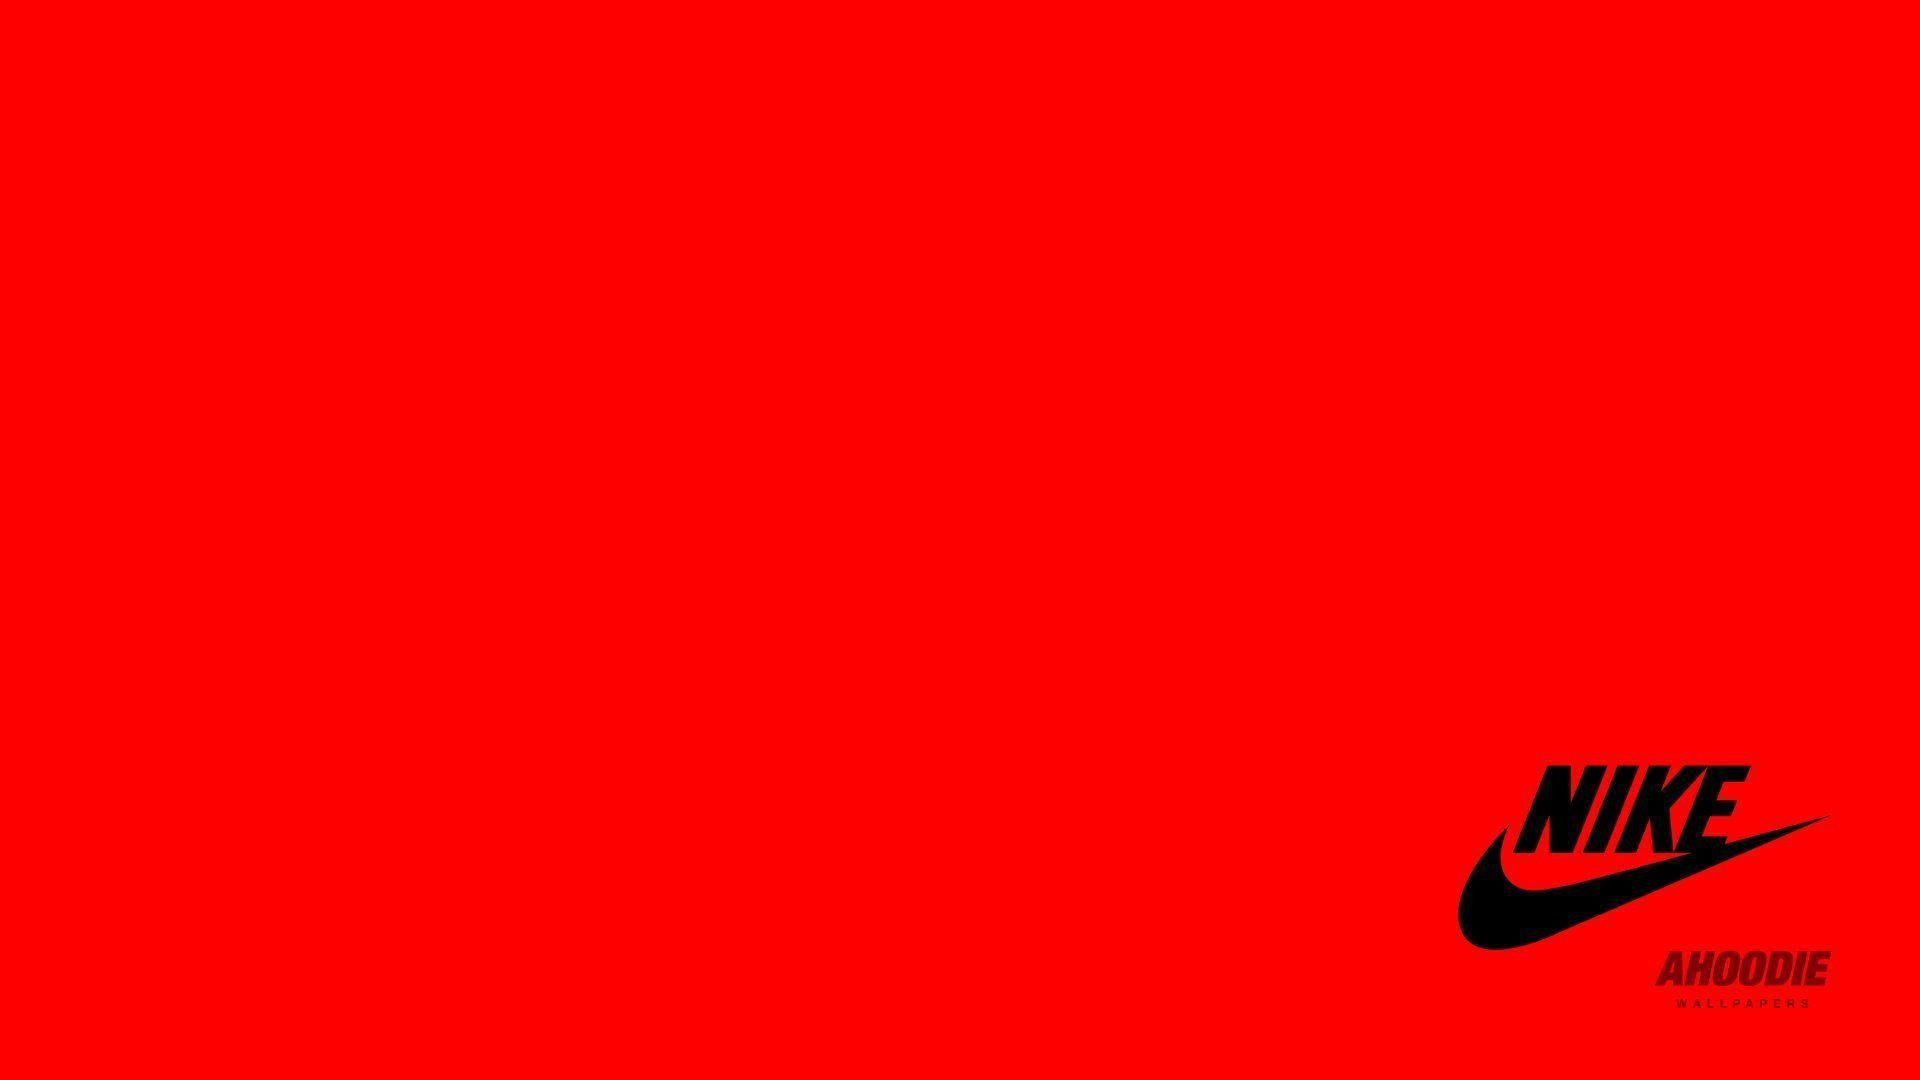 1920x1080 Amazing Manchester United Nike Wallpaper HD Logo 5098 Backgrounds For Dekstop